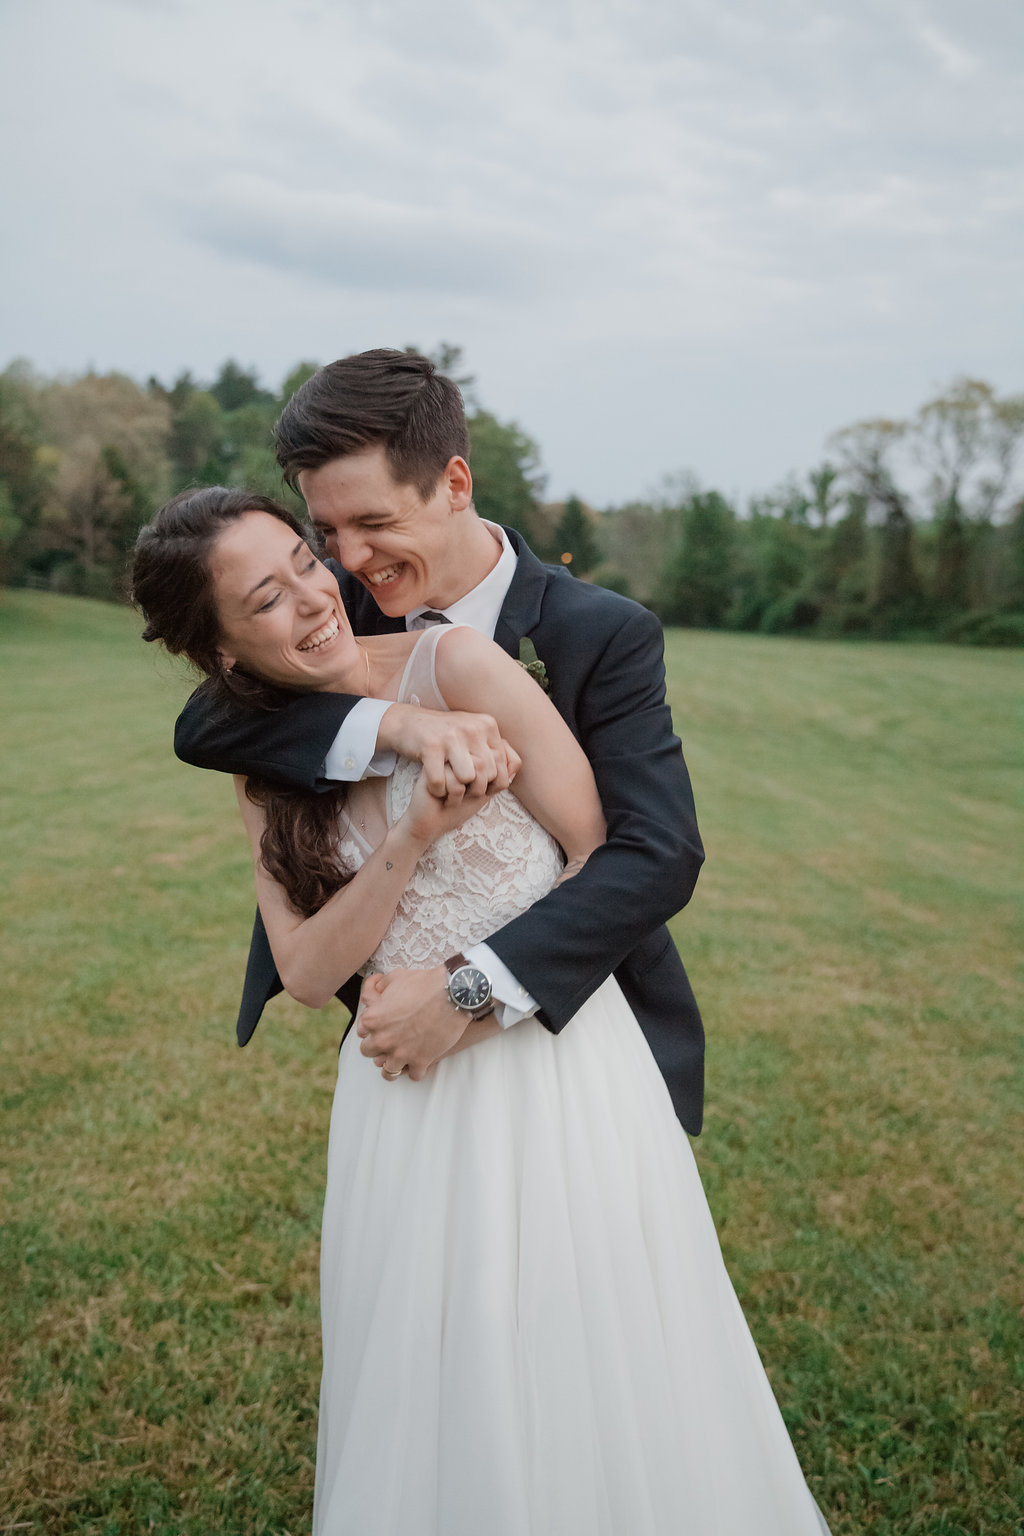 Honeysuckle-Hill-Weddings-Mallory-Patrick-125.jpg